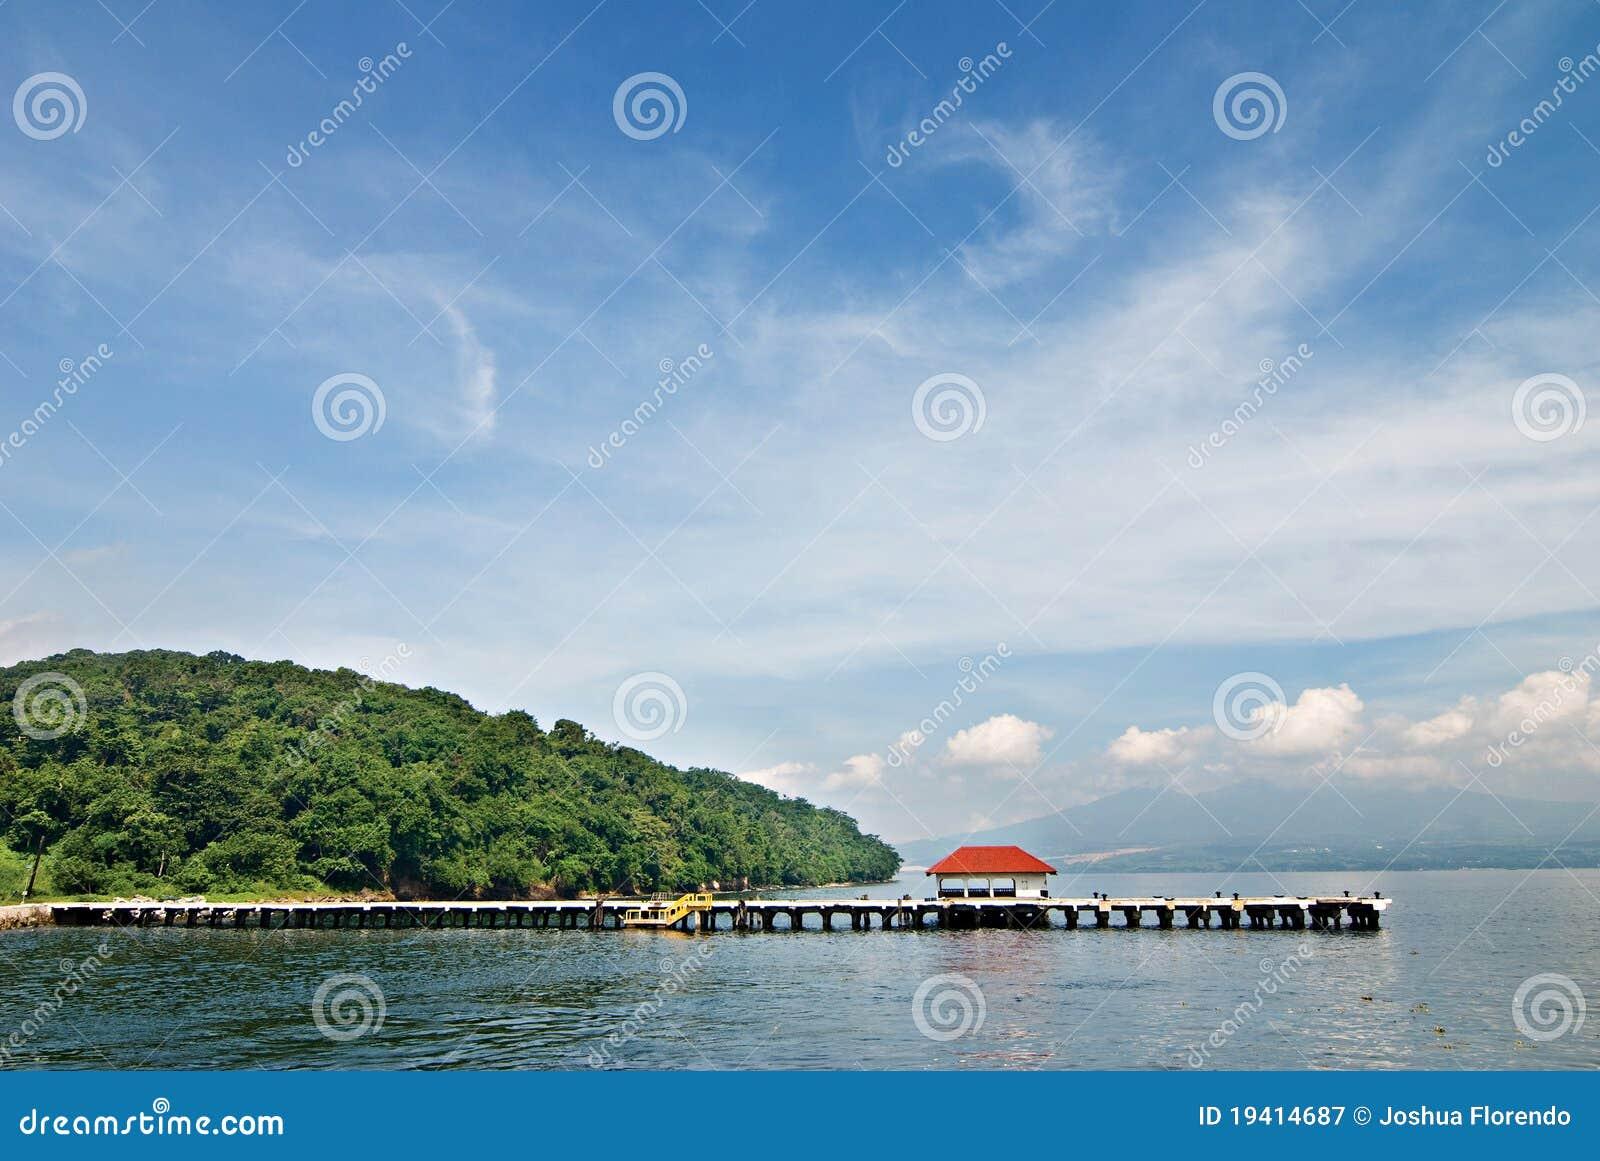 De haven van Corregidor